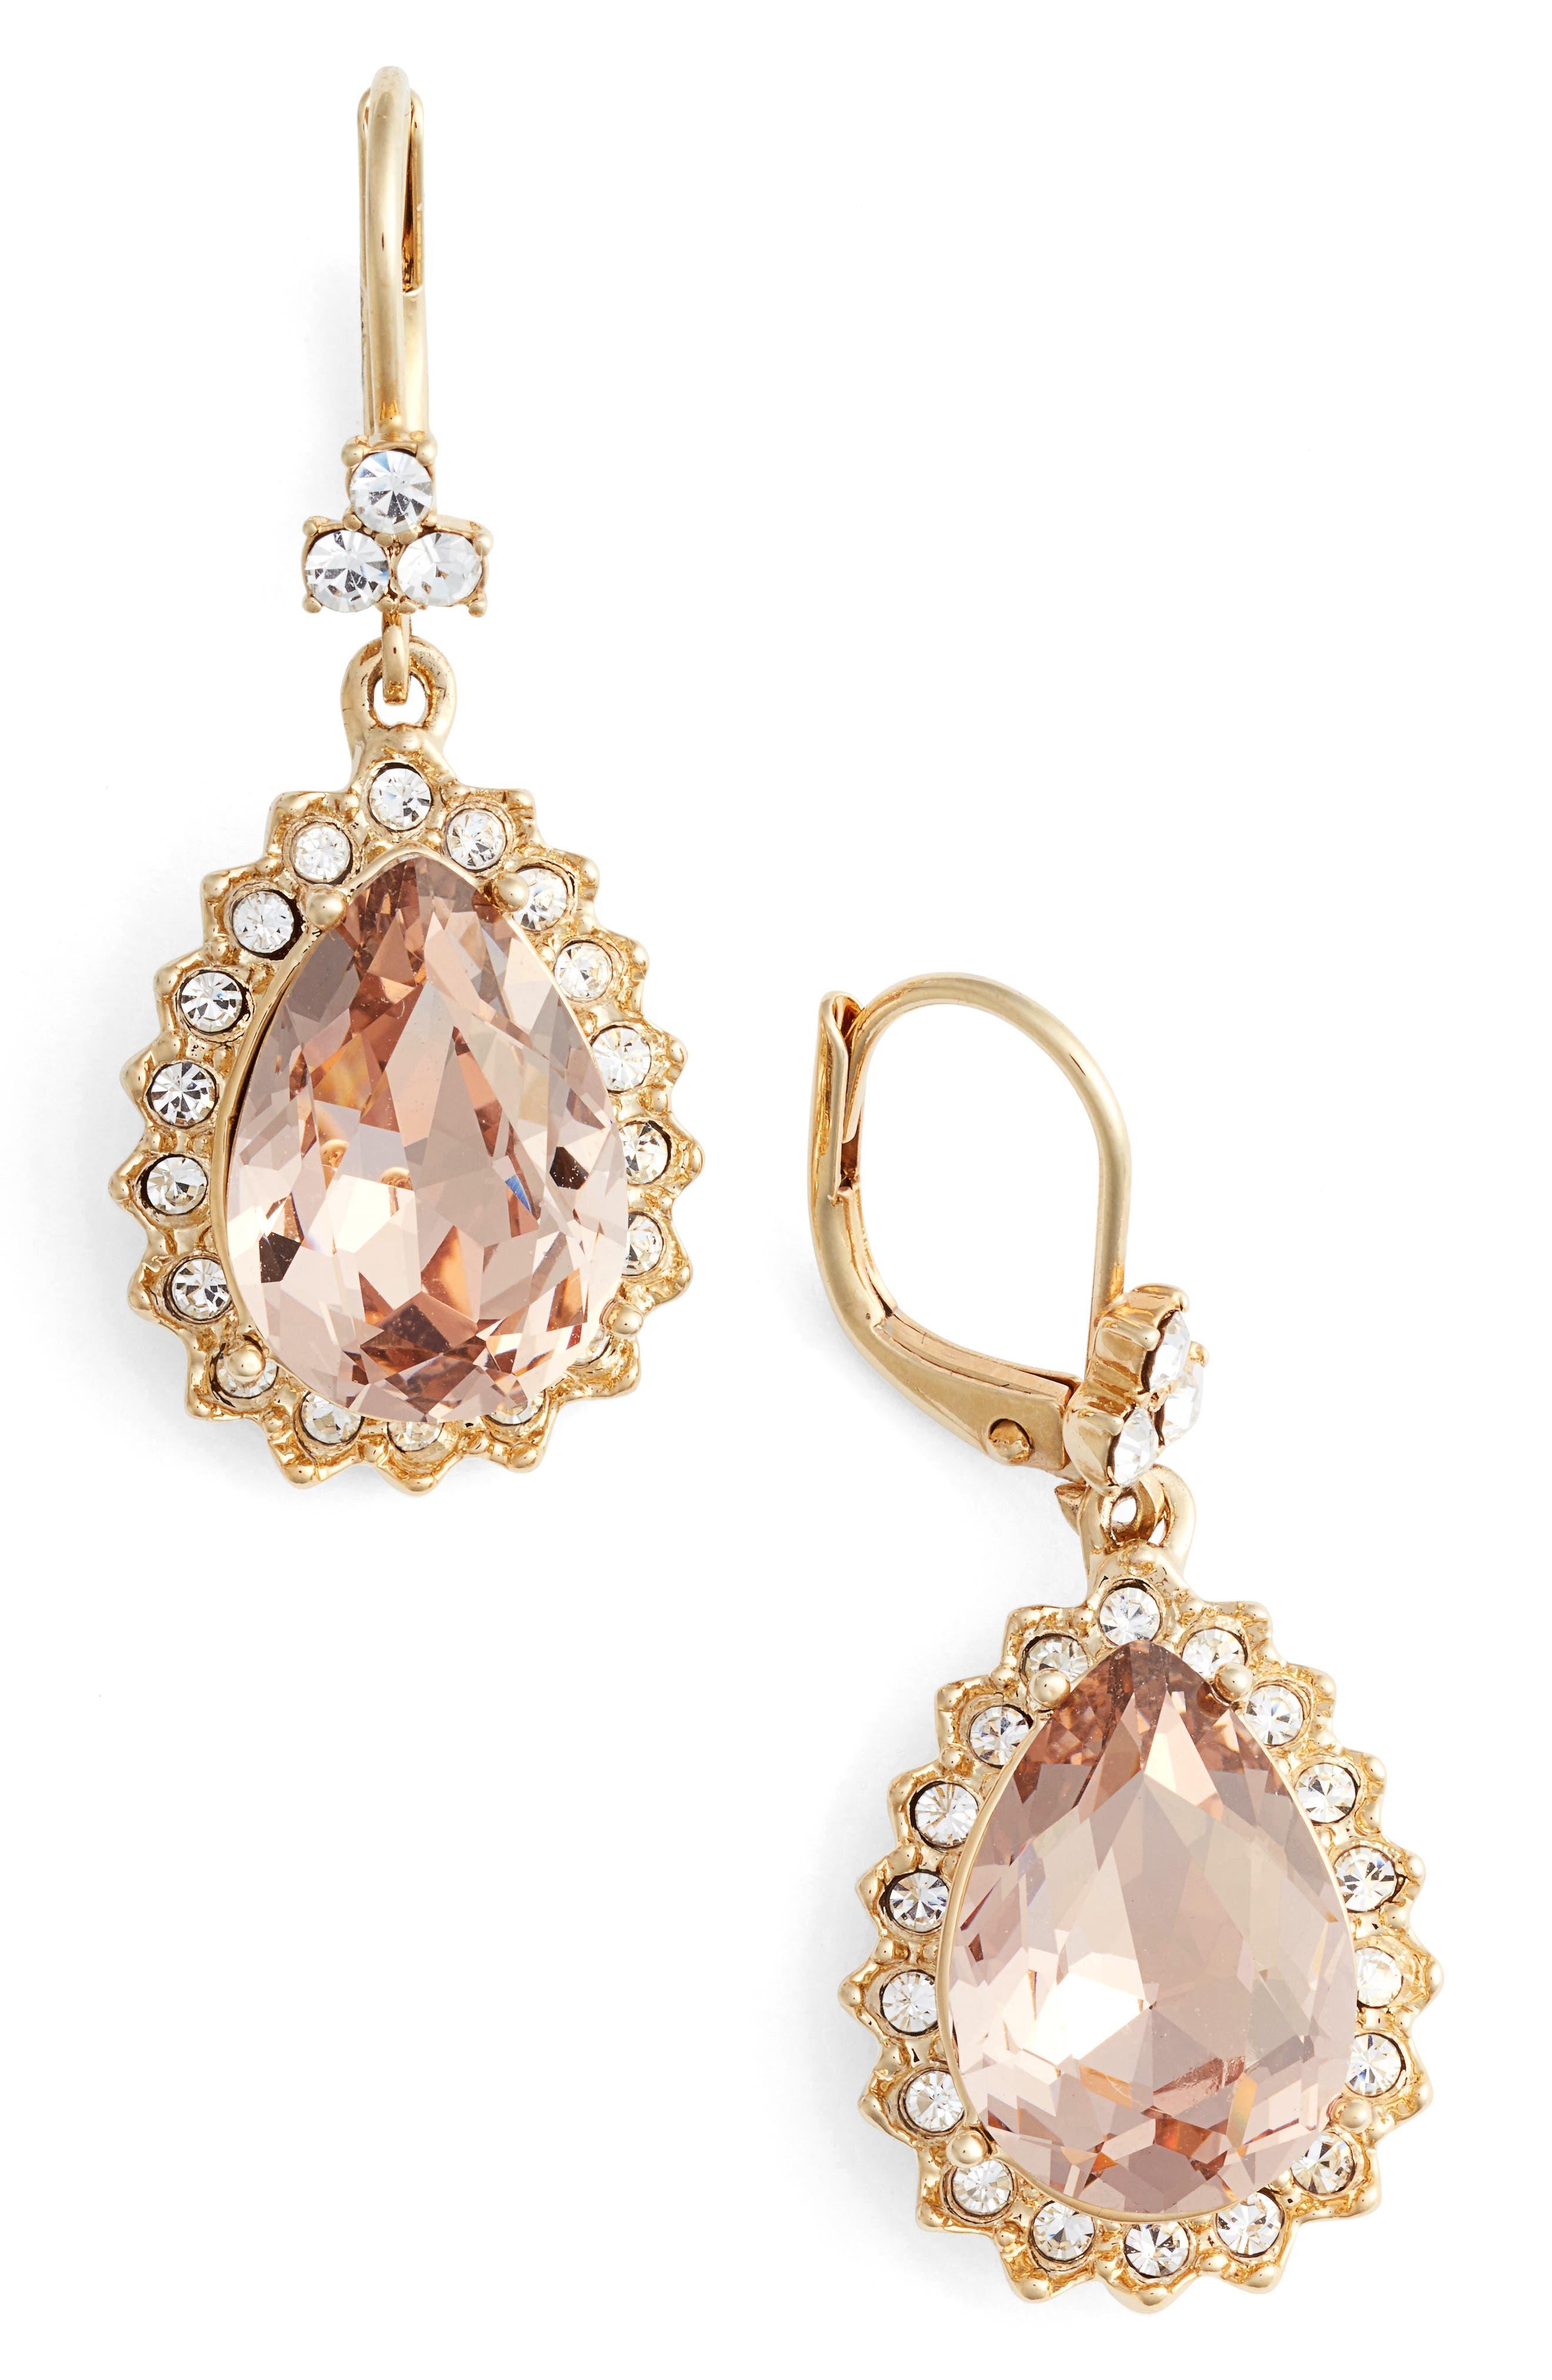 Alternate Image 1 Selected - Marchesa Sheer Bliss Pear Drop Earrings